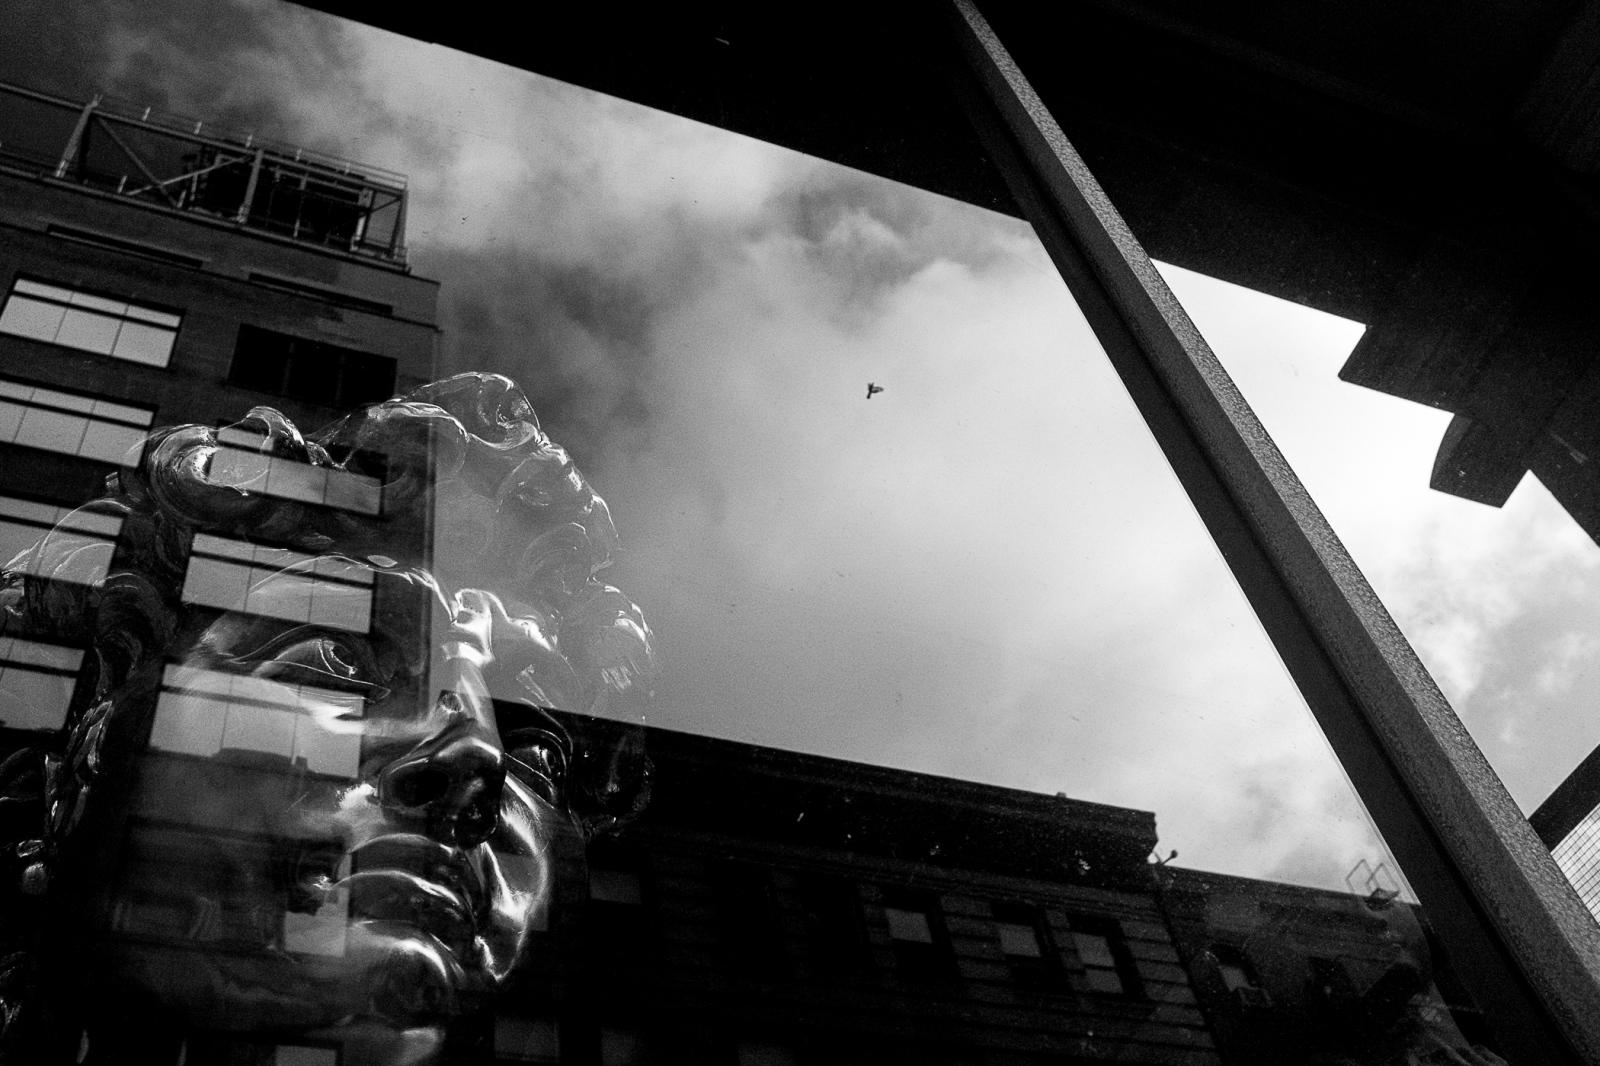 Art and Documentary Photography - Loading SebastianZuletaRios_LenteTrinchera_DSCF368201705_de_agosto_de_2017.jpg